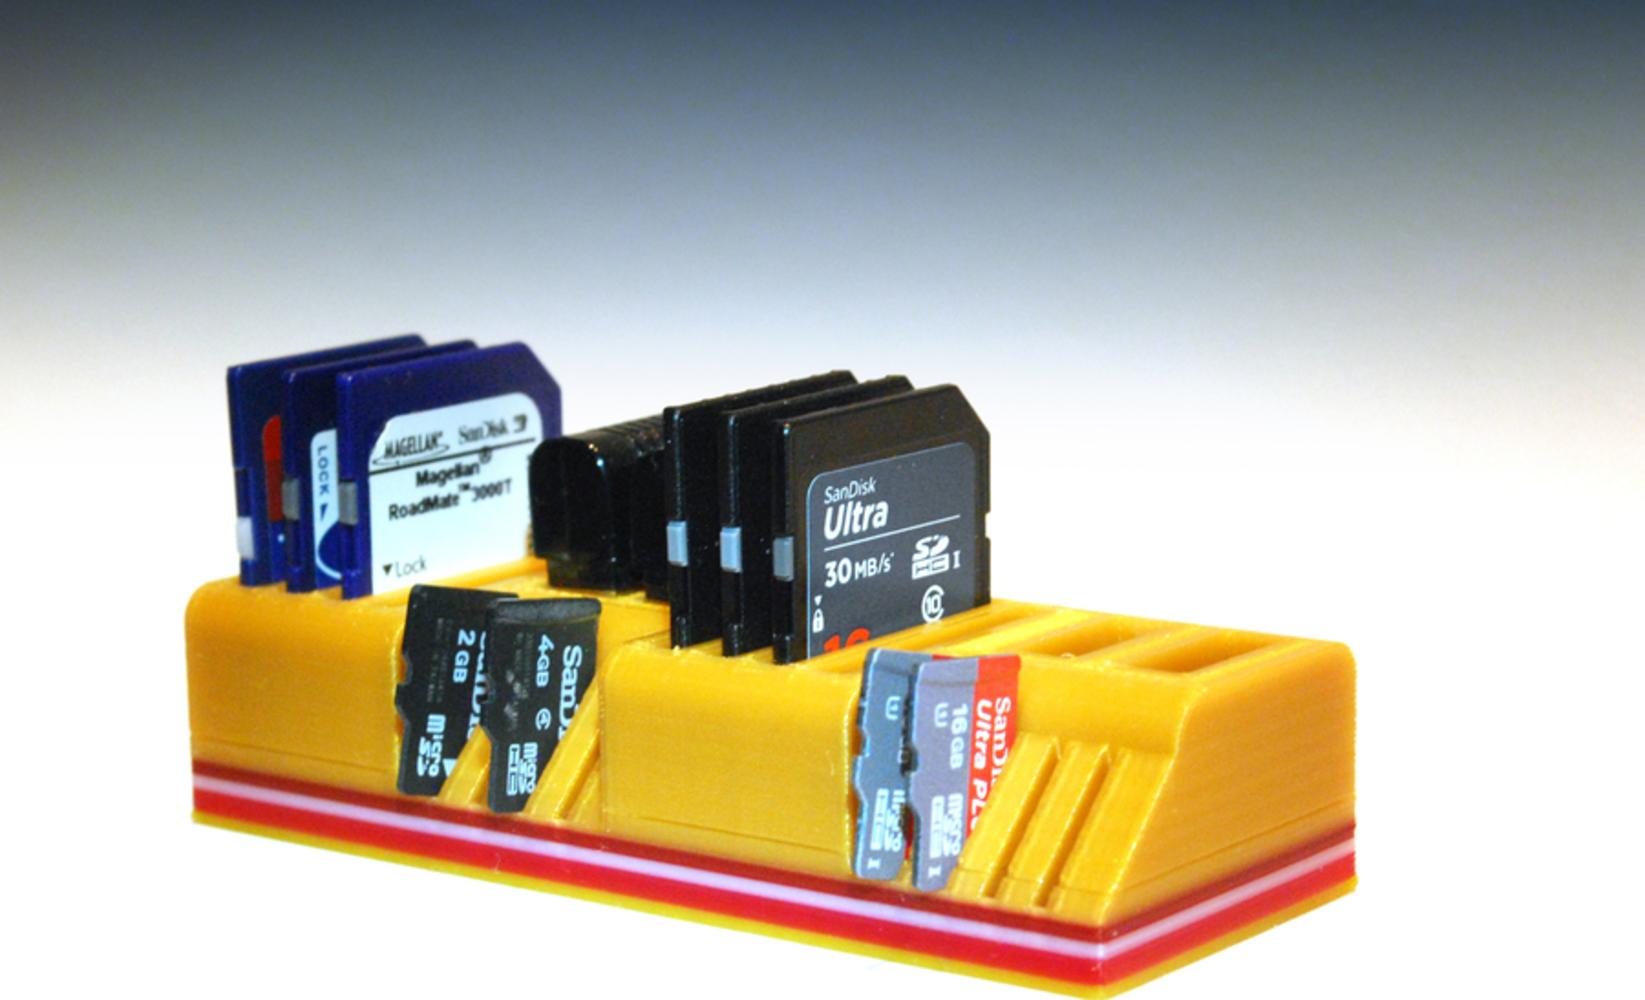 Usb sd and micro sd card holder 3d printing 99128.thumb